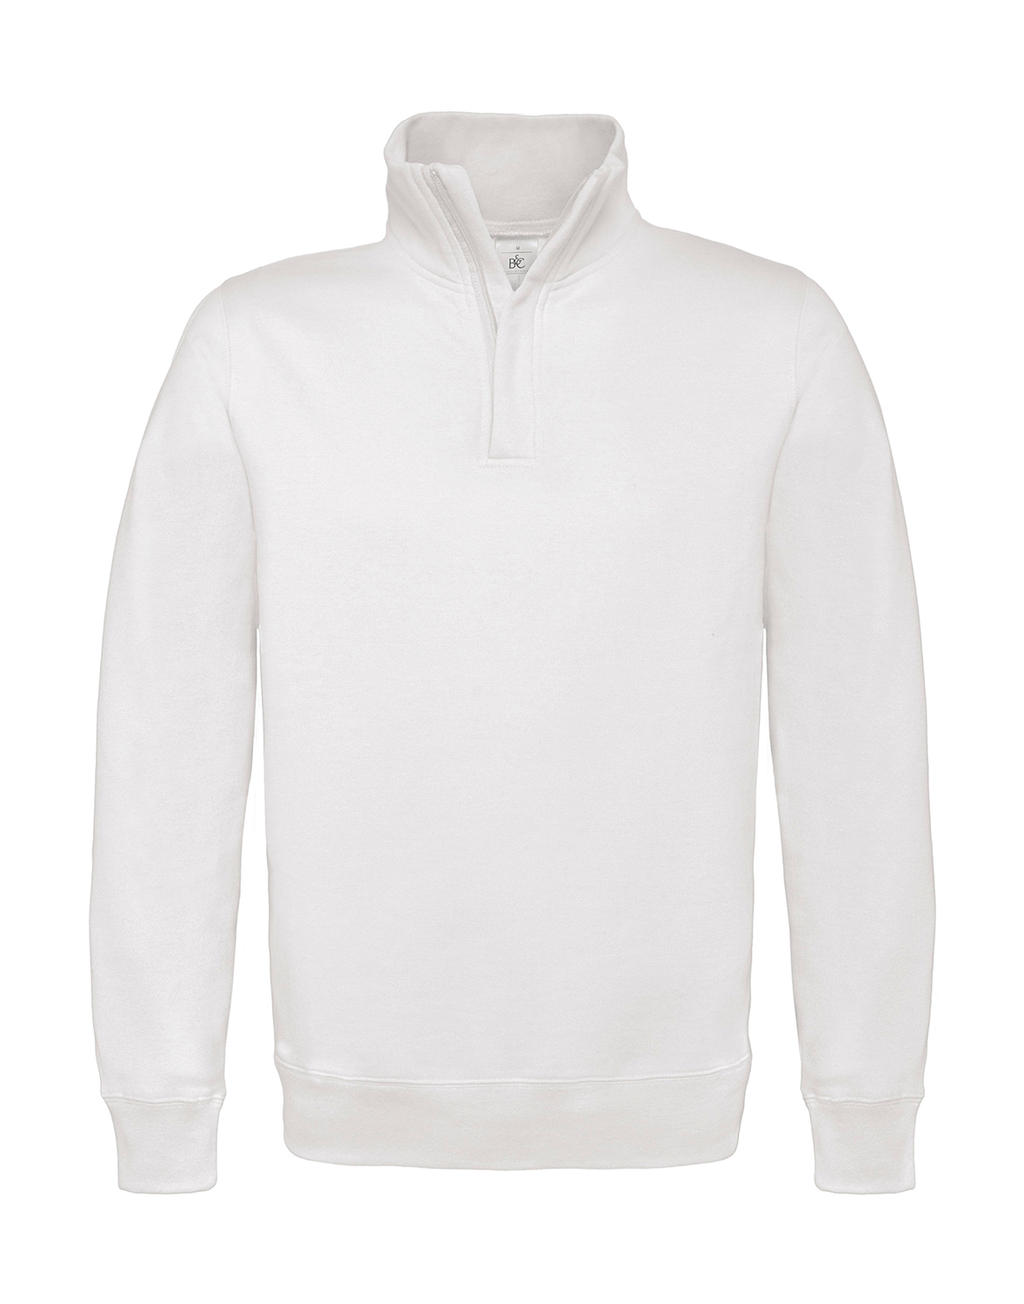 ID.004 Cotton Rich 1/4 Zip Sweat